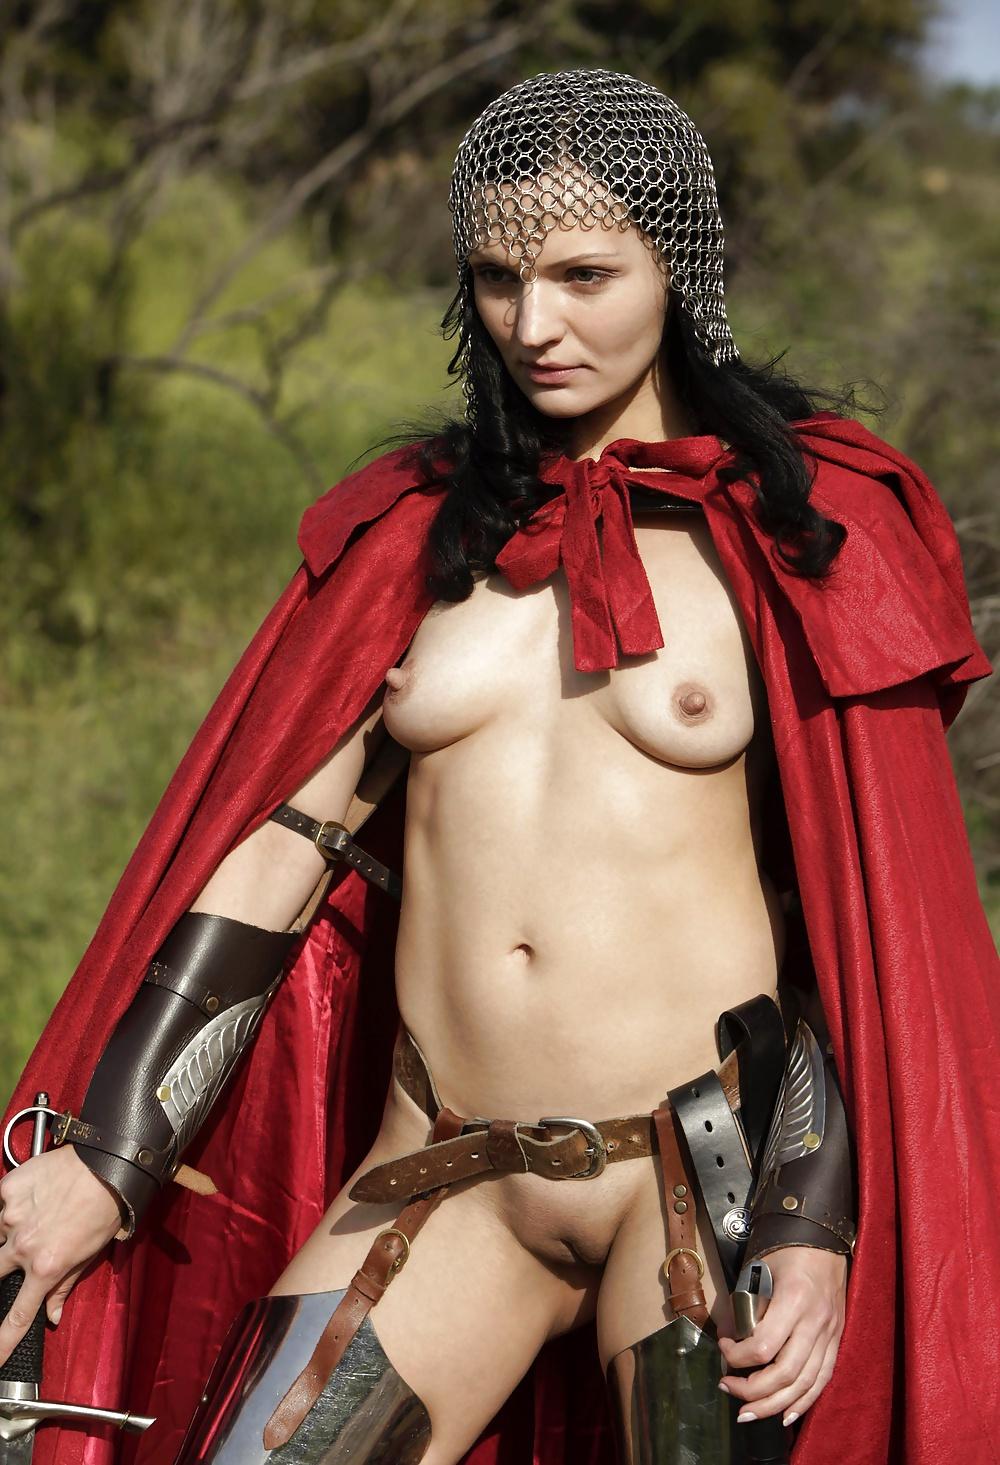 Warrior woman nude pics